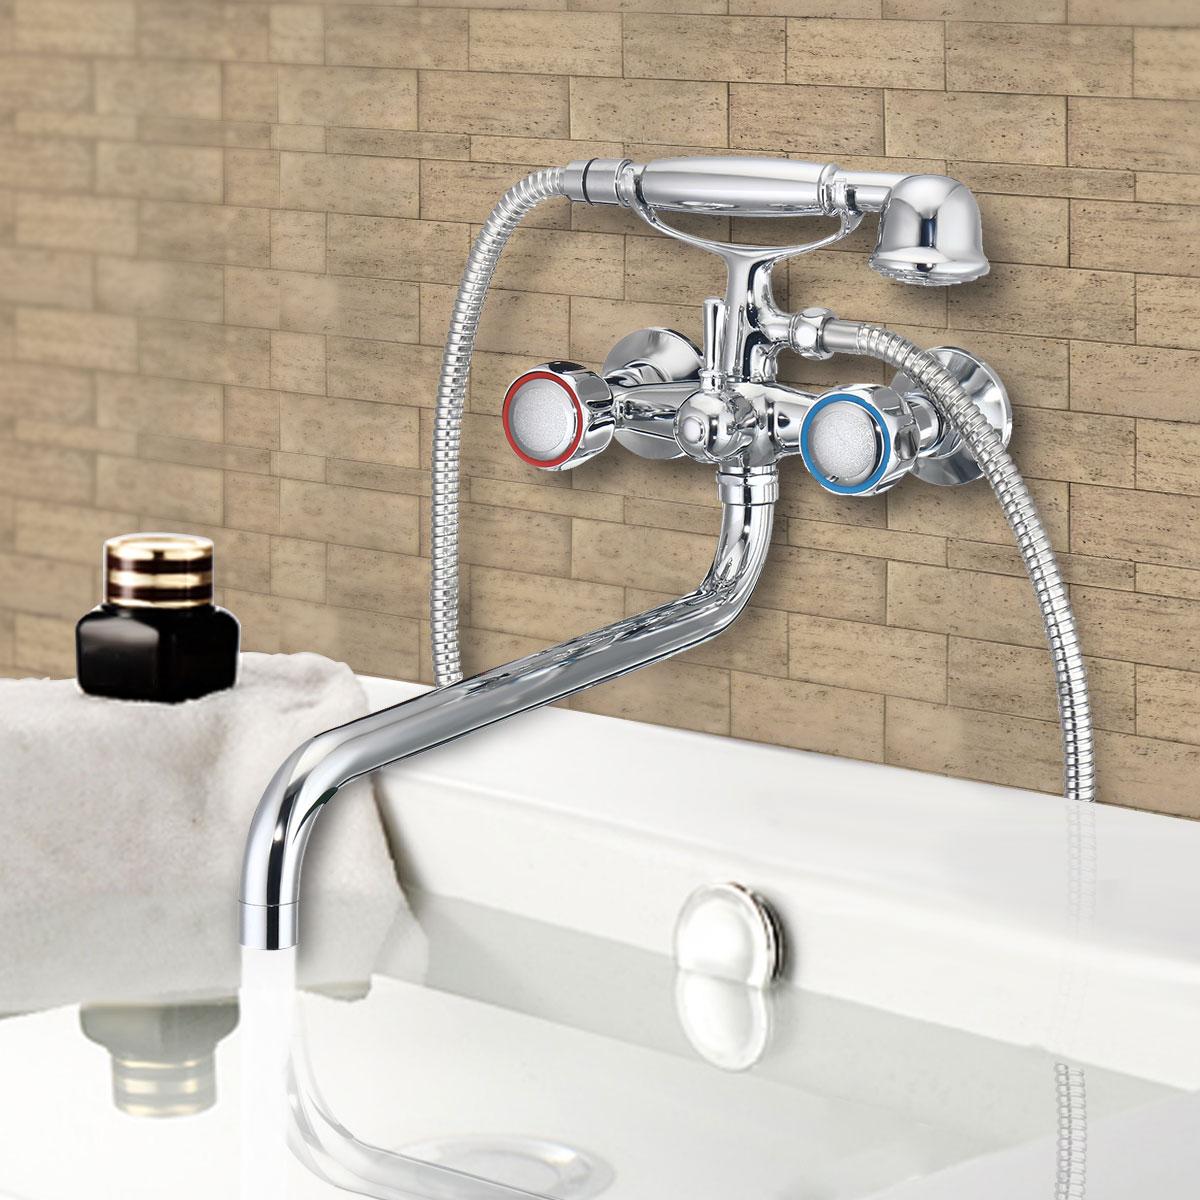 ON CLEARANCE Chrome Wall Mounted Bathroom Bathtub Shower Faucet Set Mixer + Hand Sprayer